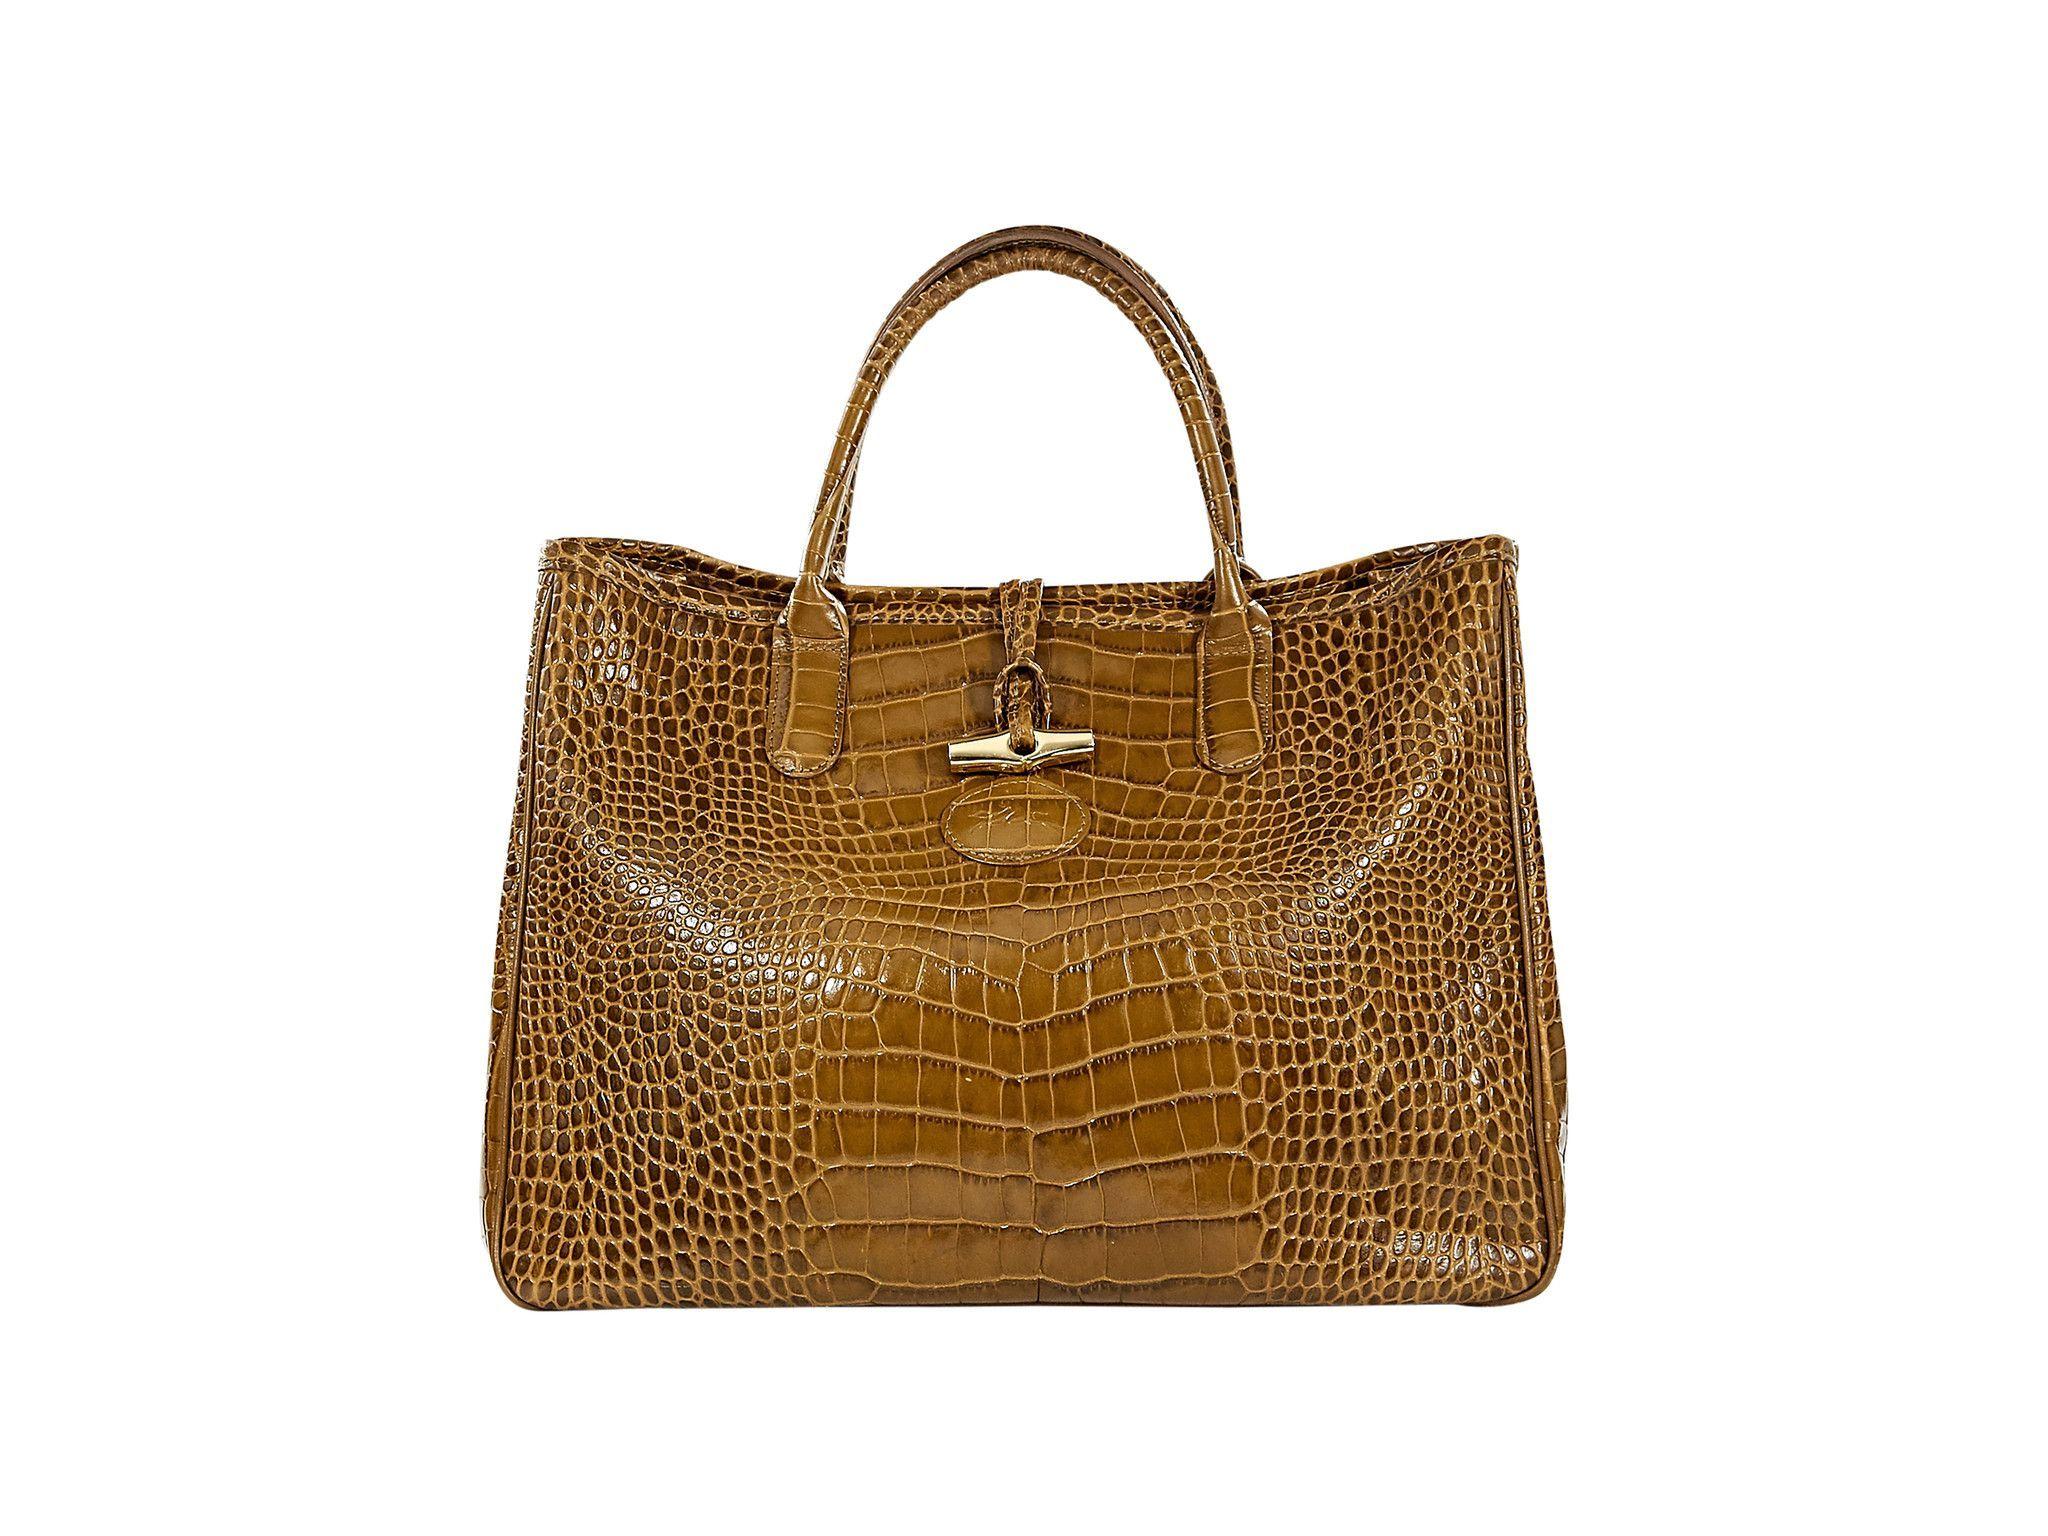 Olive Longchamp Crocodile Embossed Tote Bag